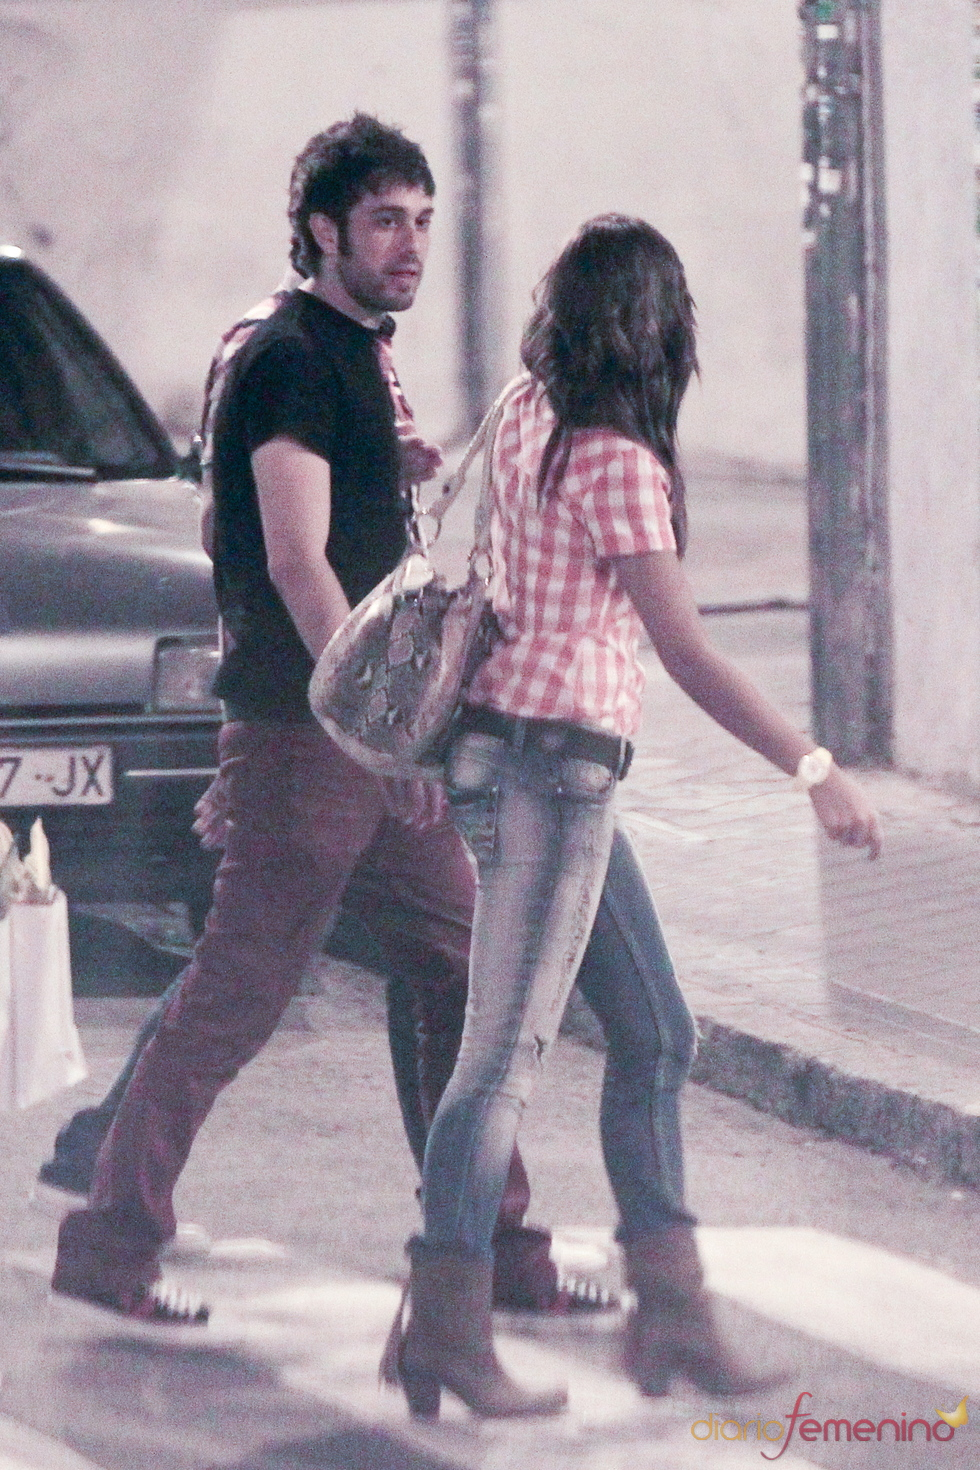 Lara Álvarez y Dani Martínez se divierten por las calles de Madrid